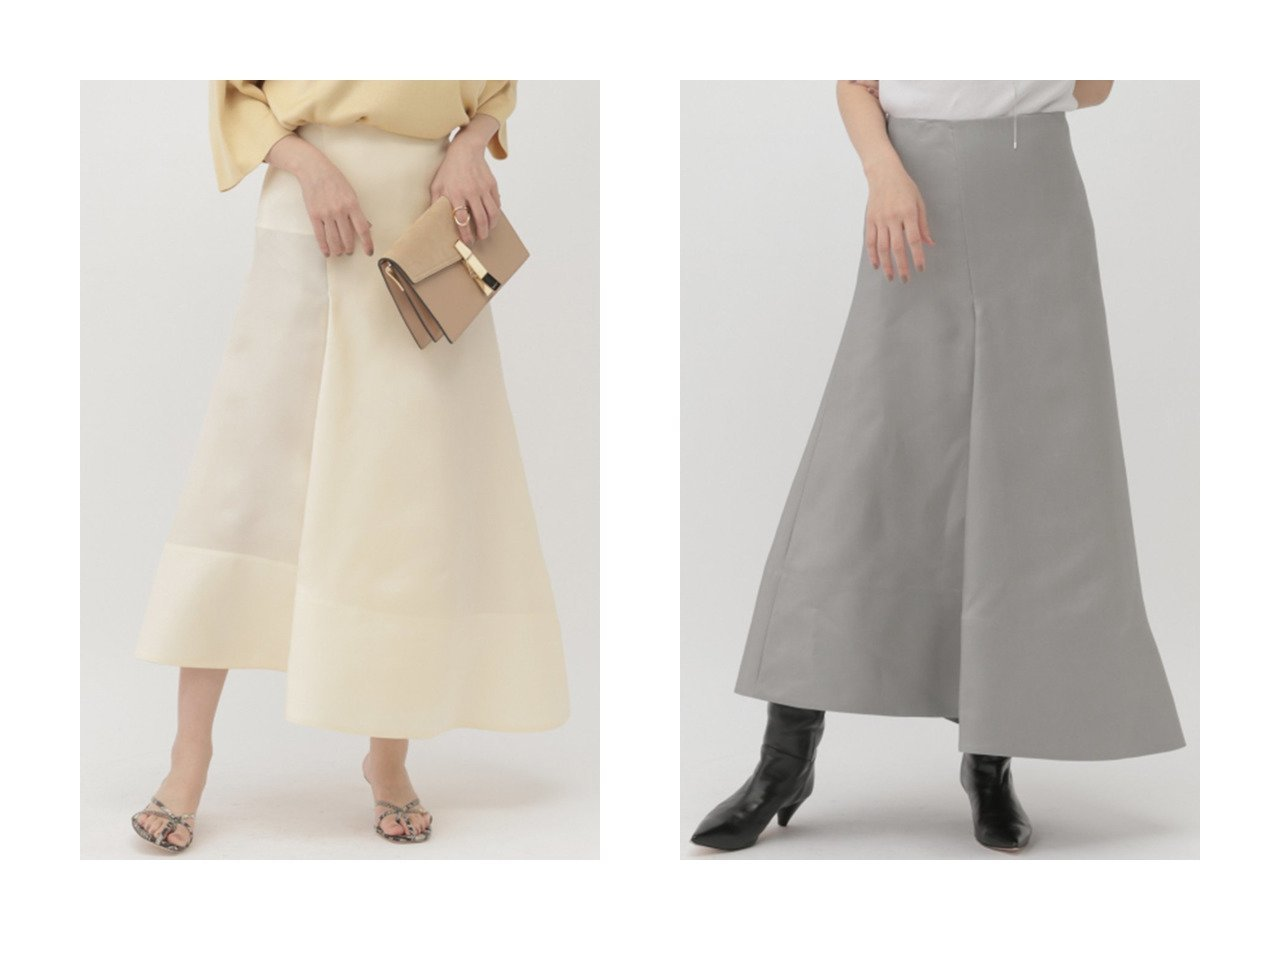 【Chaos/カオス】のダブルオーガンスカート スカートのおすすめ!人気、トレンド・レディースファッションの通販 おすすめで人気の流行・トレンド、ファッションの通販商品 メンズファッション・キッズファッション・インテリア・家具・レディースファッション・服の通販 founy(ファニー) https://founy.com/ ファッション Fashion レディースファッション WOMEN スカート Skirt ロングスカート Long Skirt 2021年 2021 2021 春夏 S/S SS Spring/Summer 2021 S/S 春夏 SS Spring/Summer アシンメトリー オーガンジー シルク ジャケット セットアップ フロント ラップ ロング 春 Spring  ID:crp329100000015298